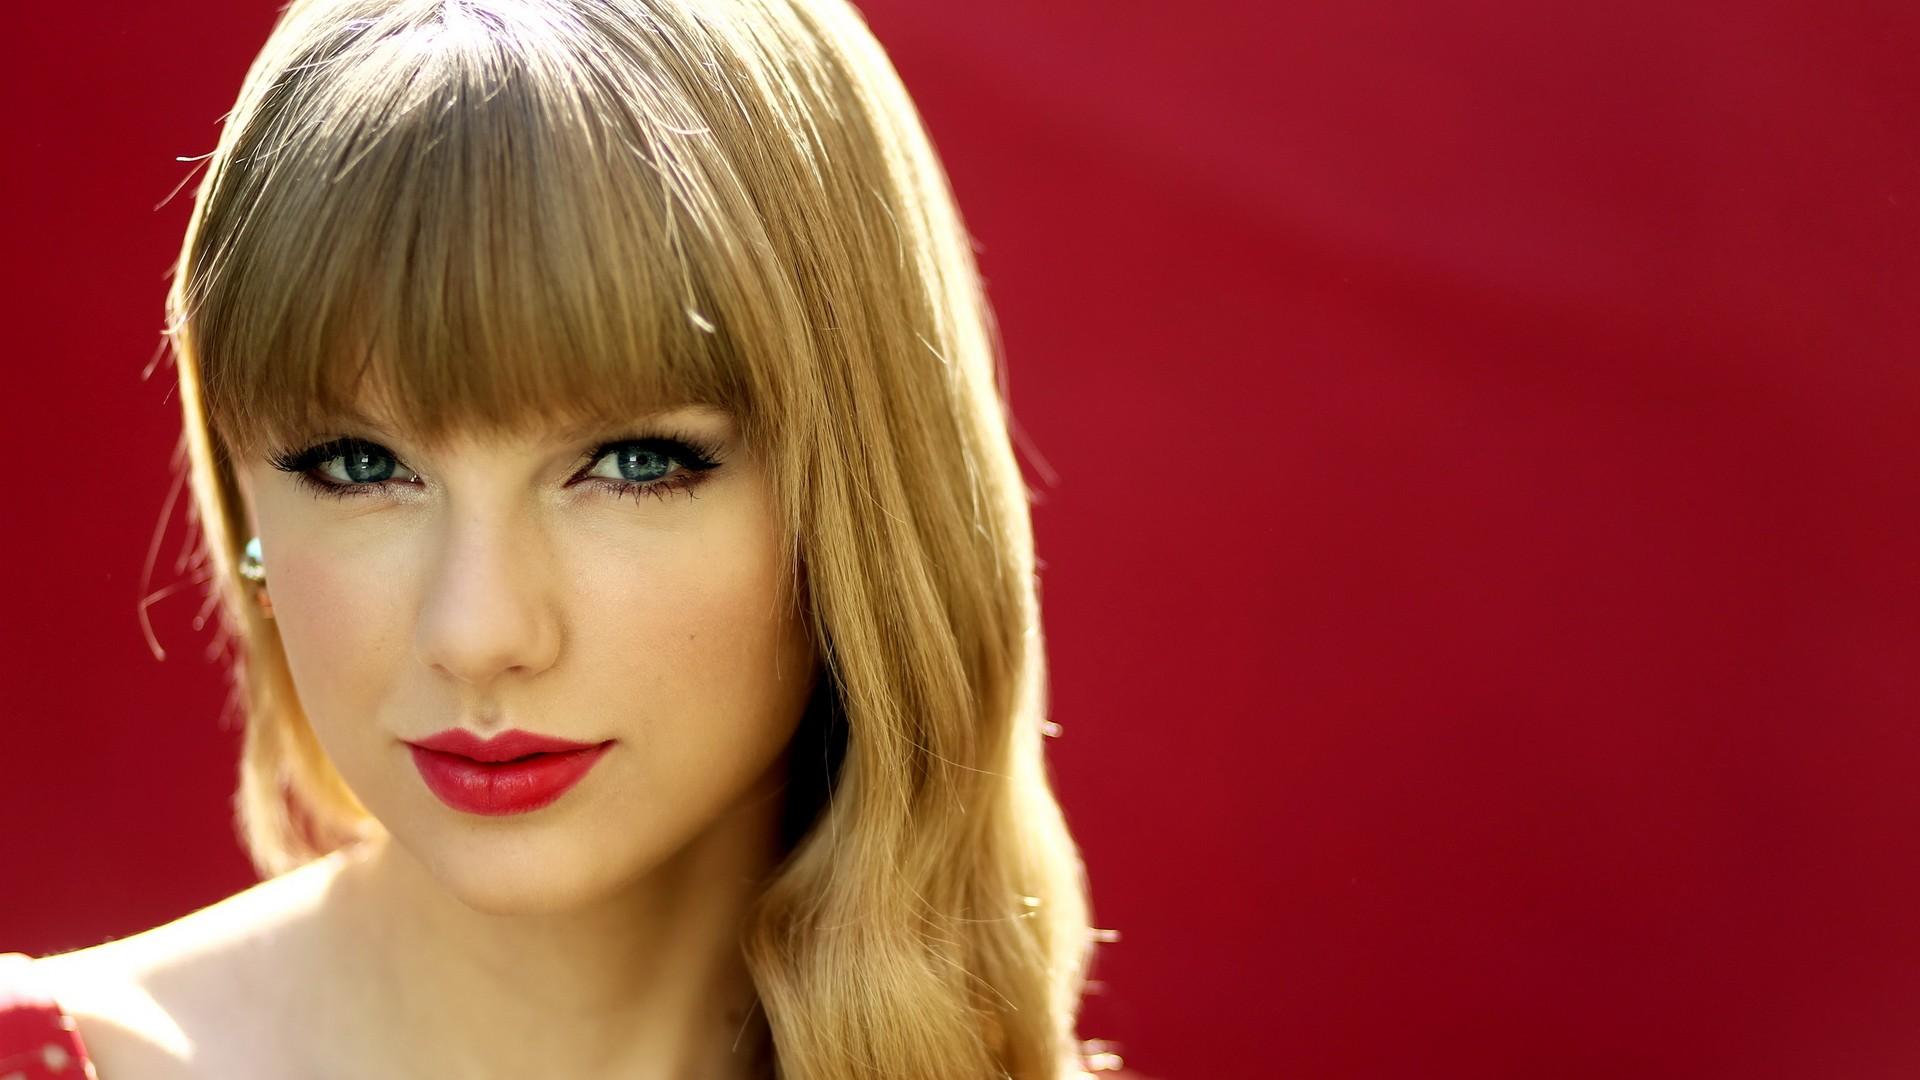 ... Taylor Swift Wallpaper · Taylor Swift Wallpaper